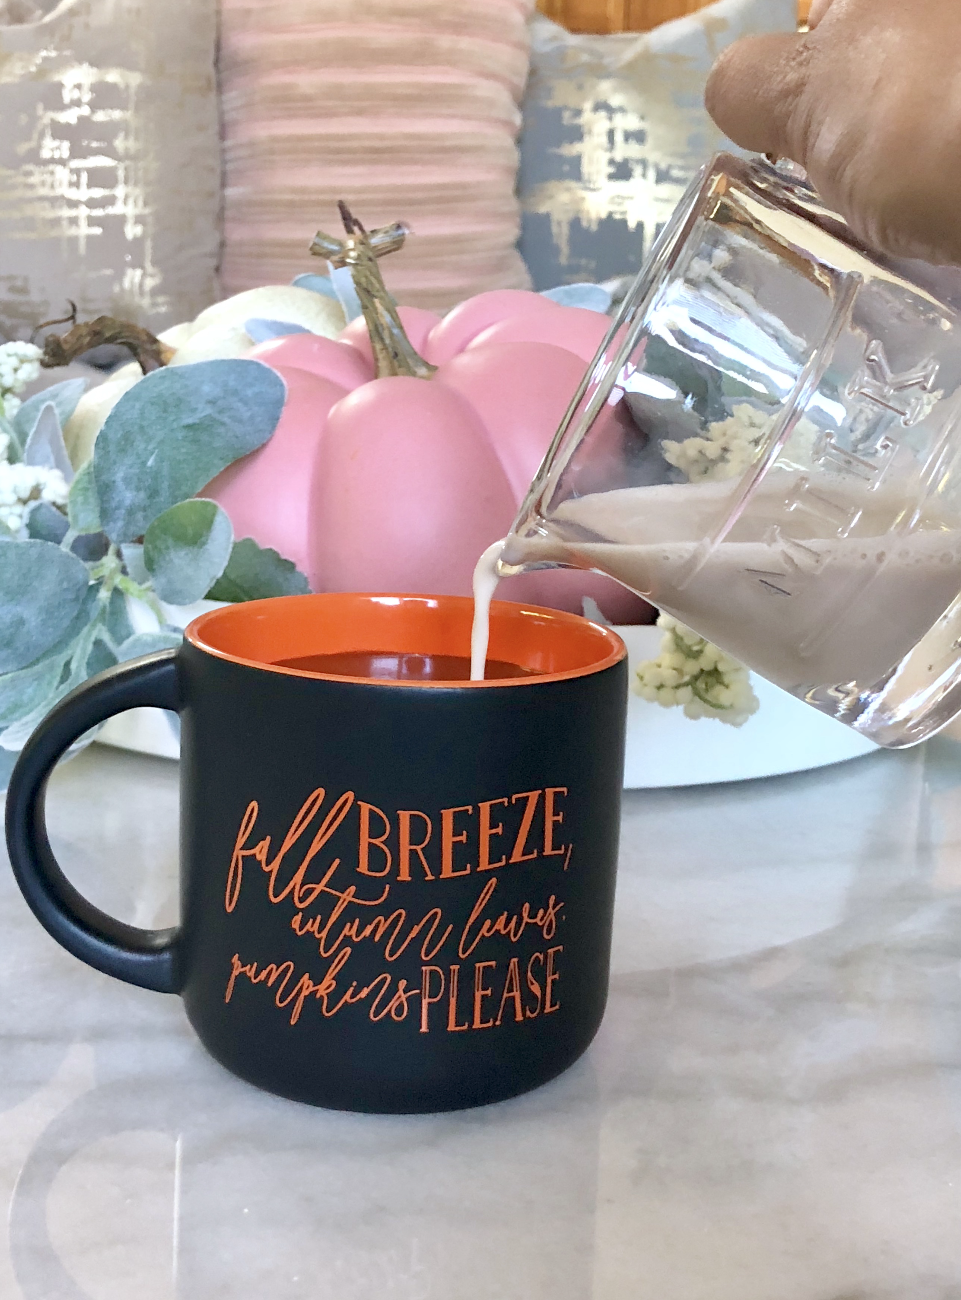 Fall Breeze, Autumn Leaves, Pumpkins Please Coffee Mug in